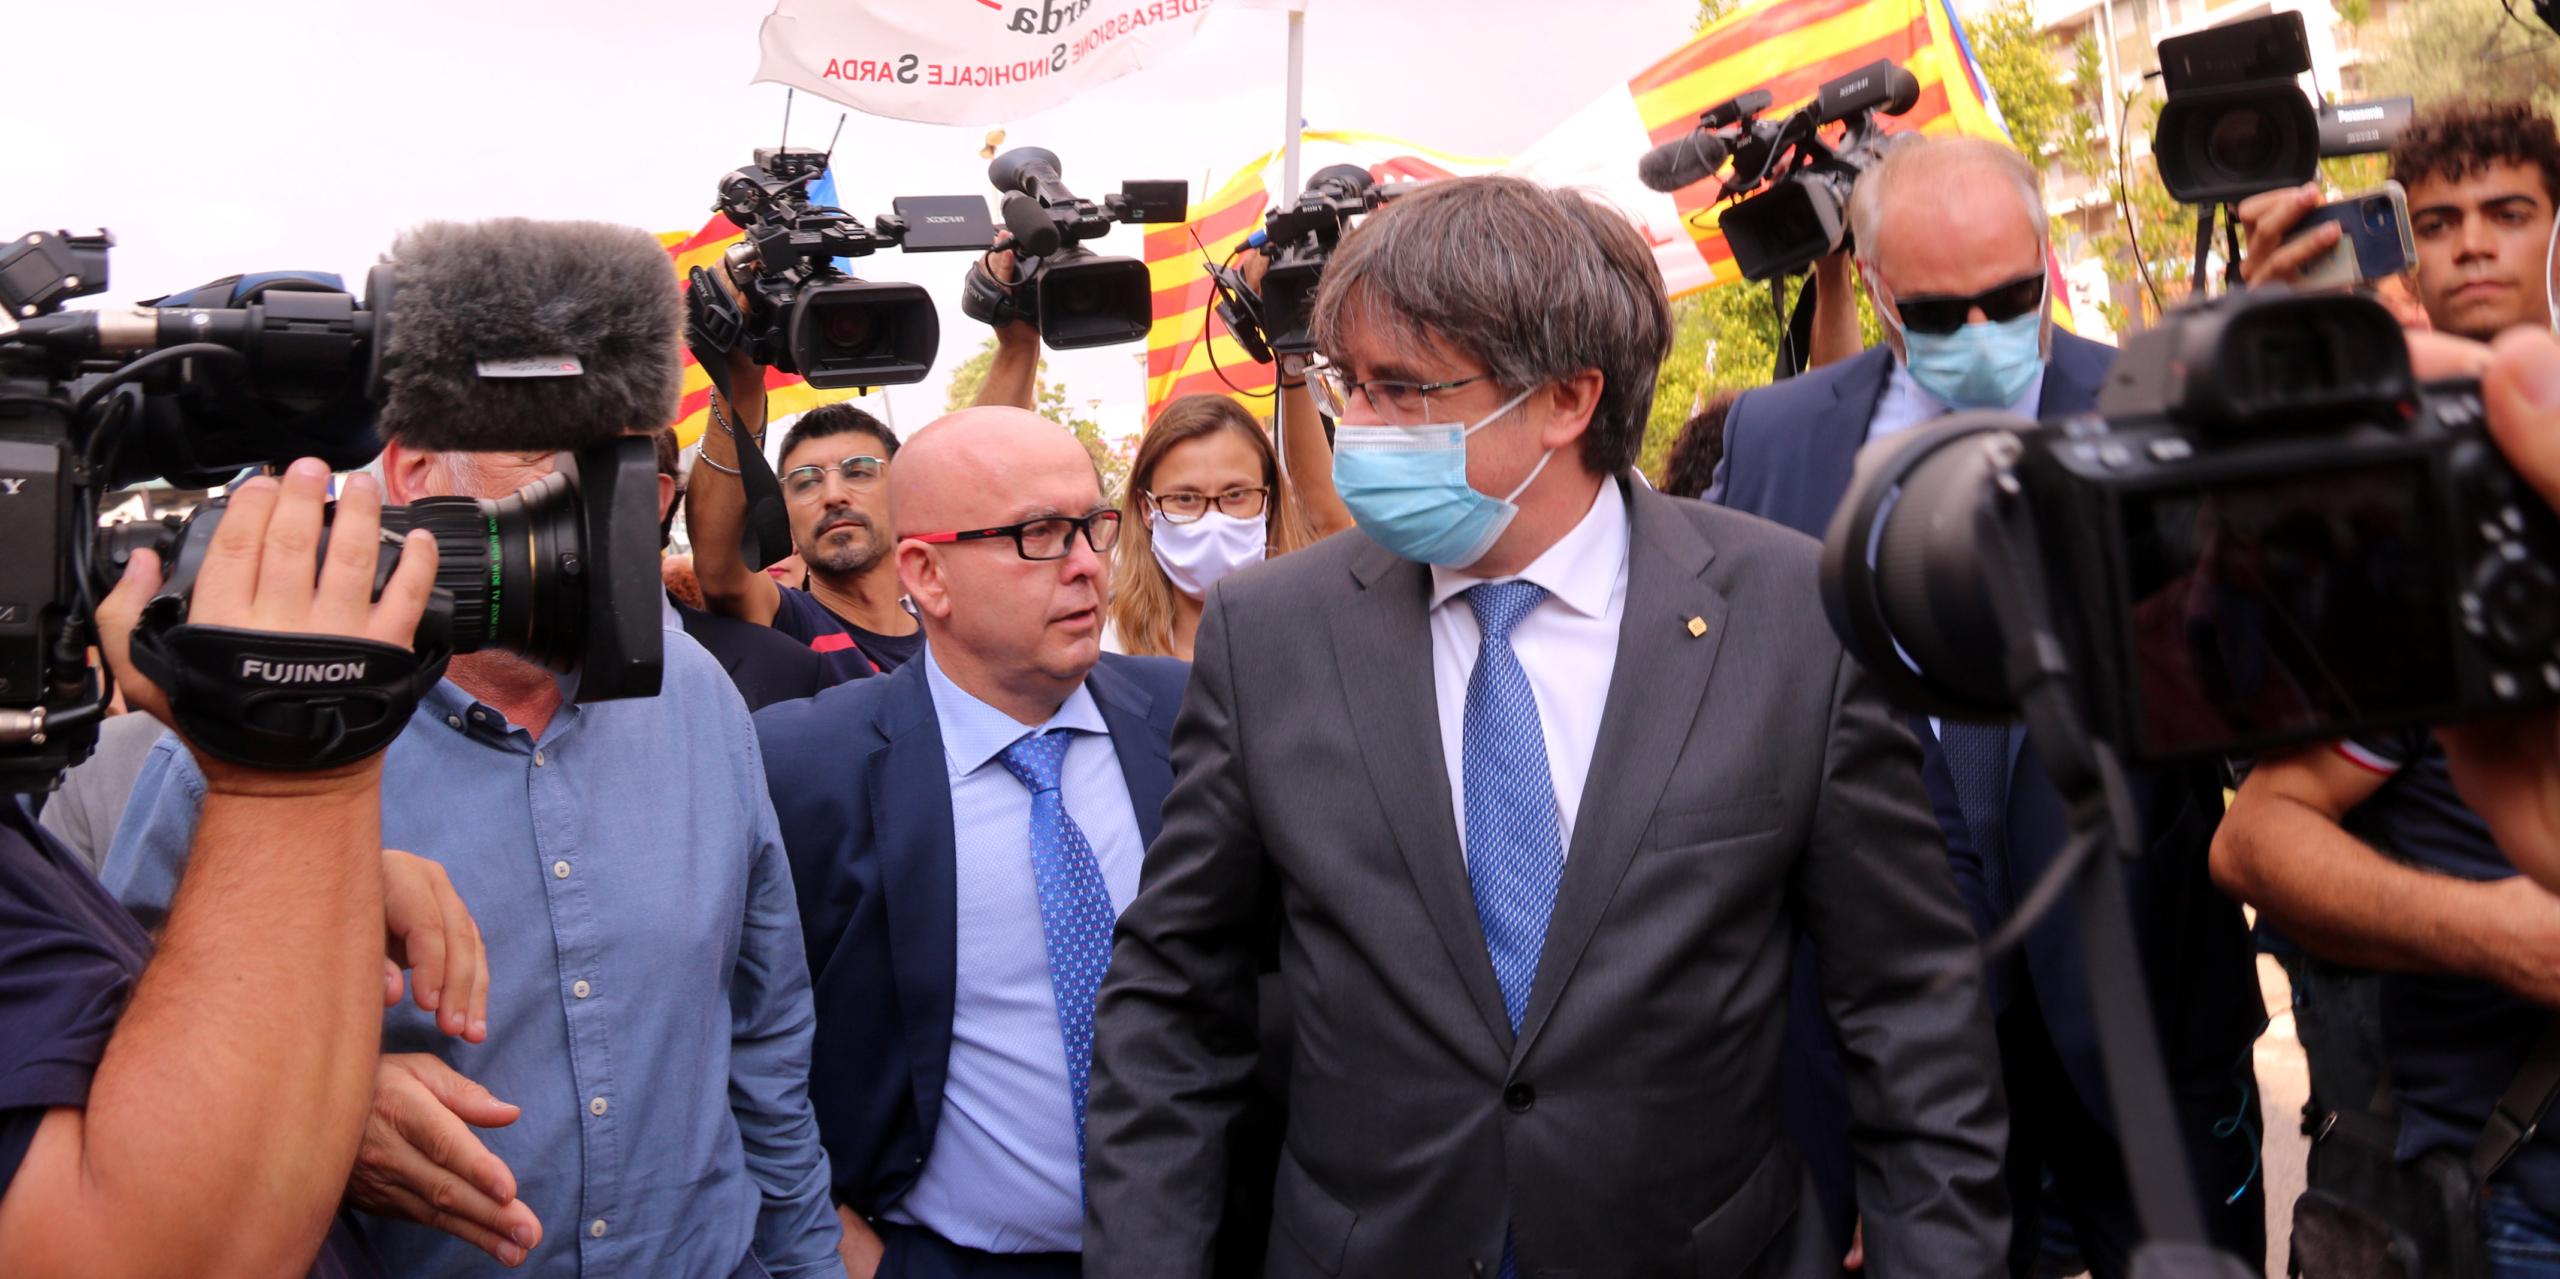 Carles Puigdemont surt del Tribunal de Sàsser | ACN